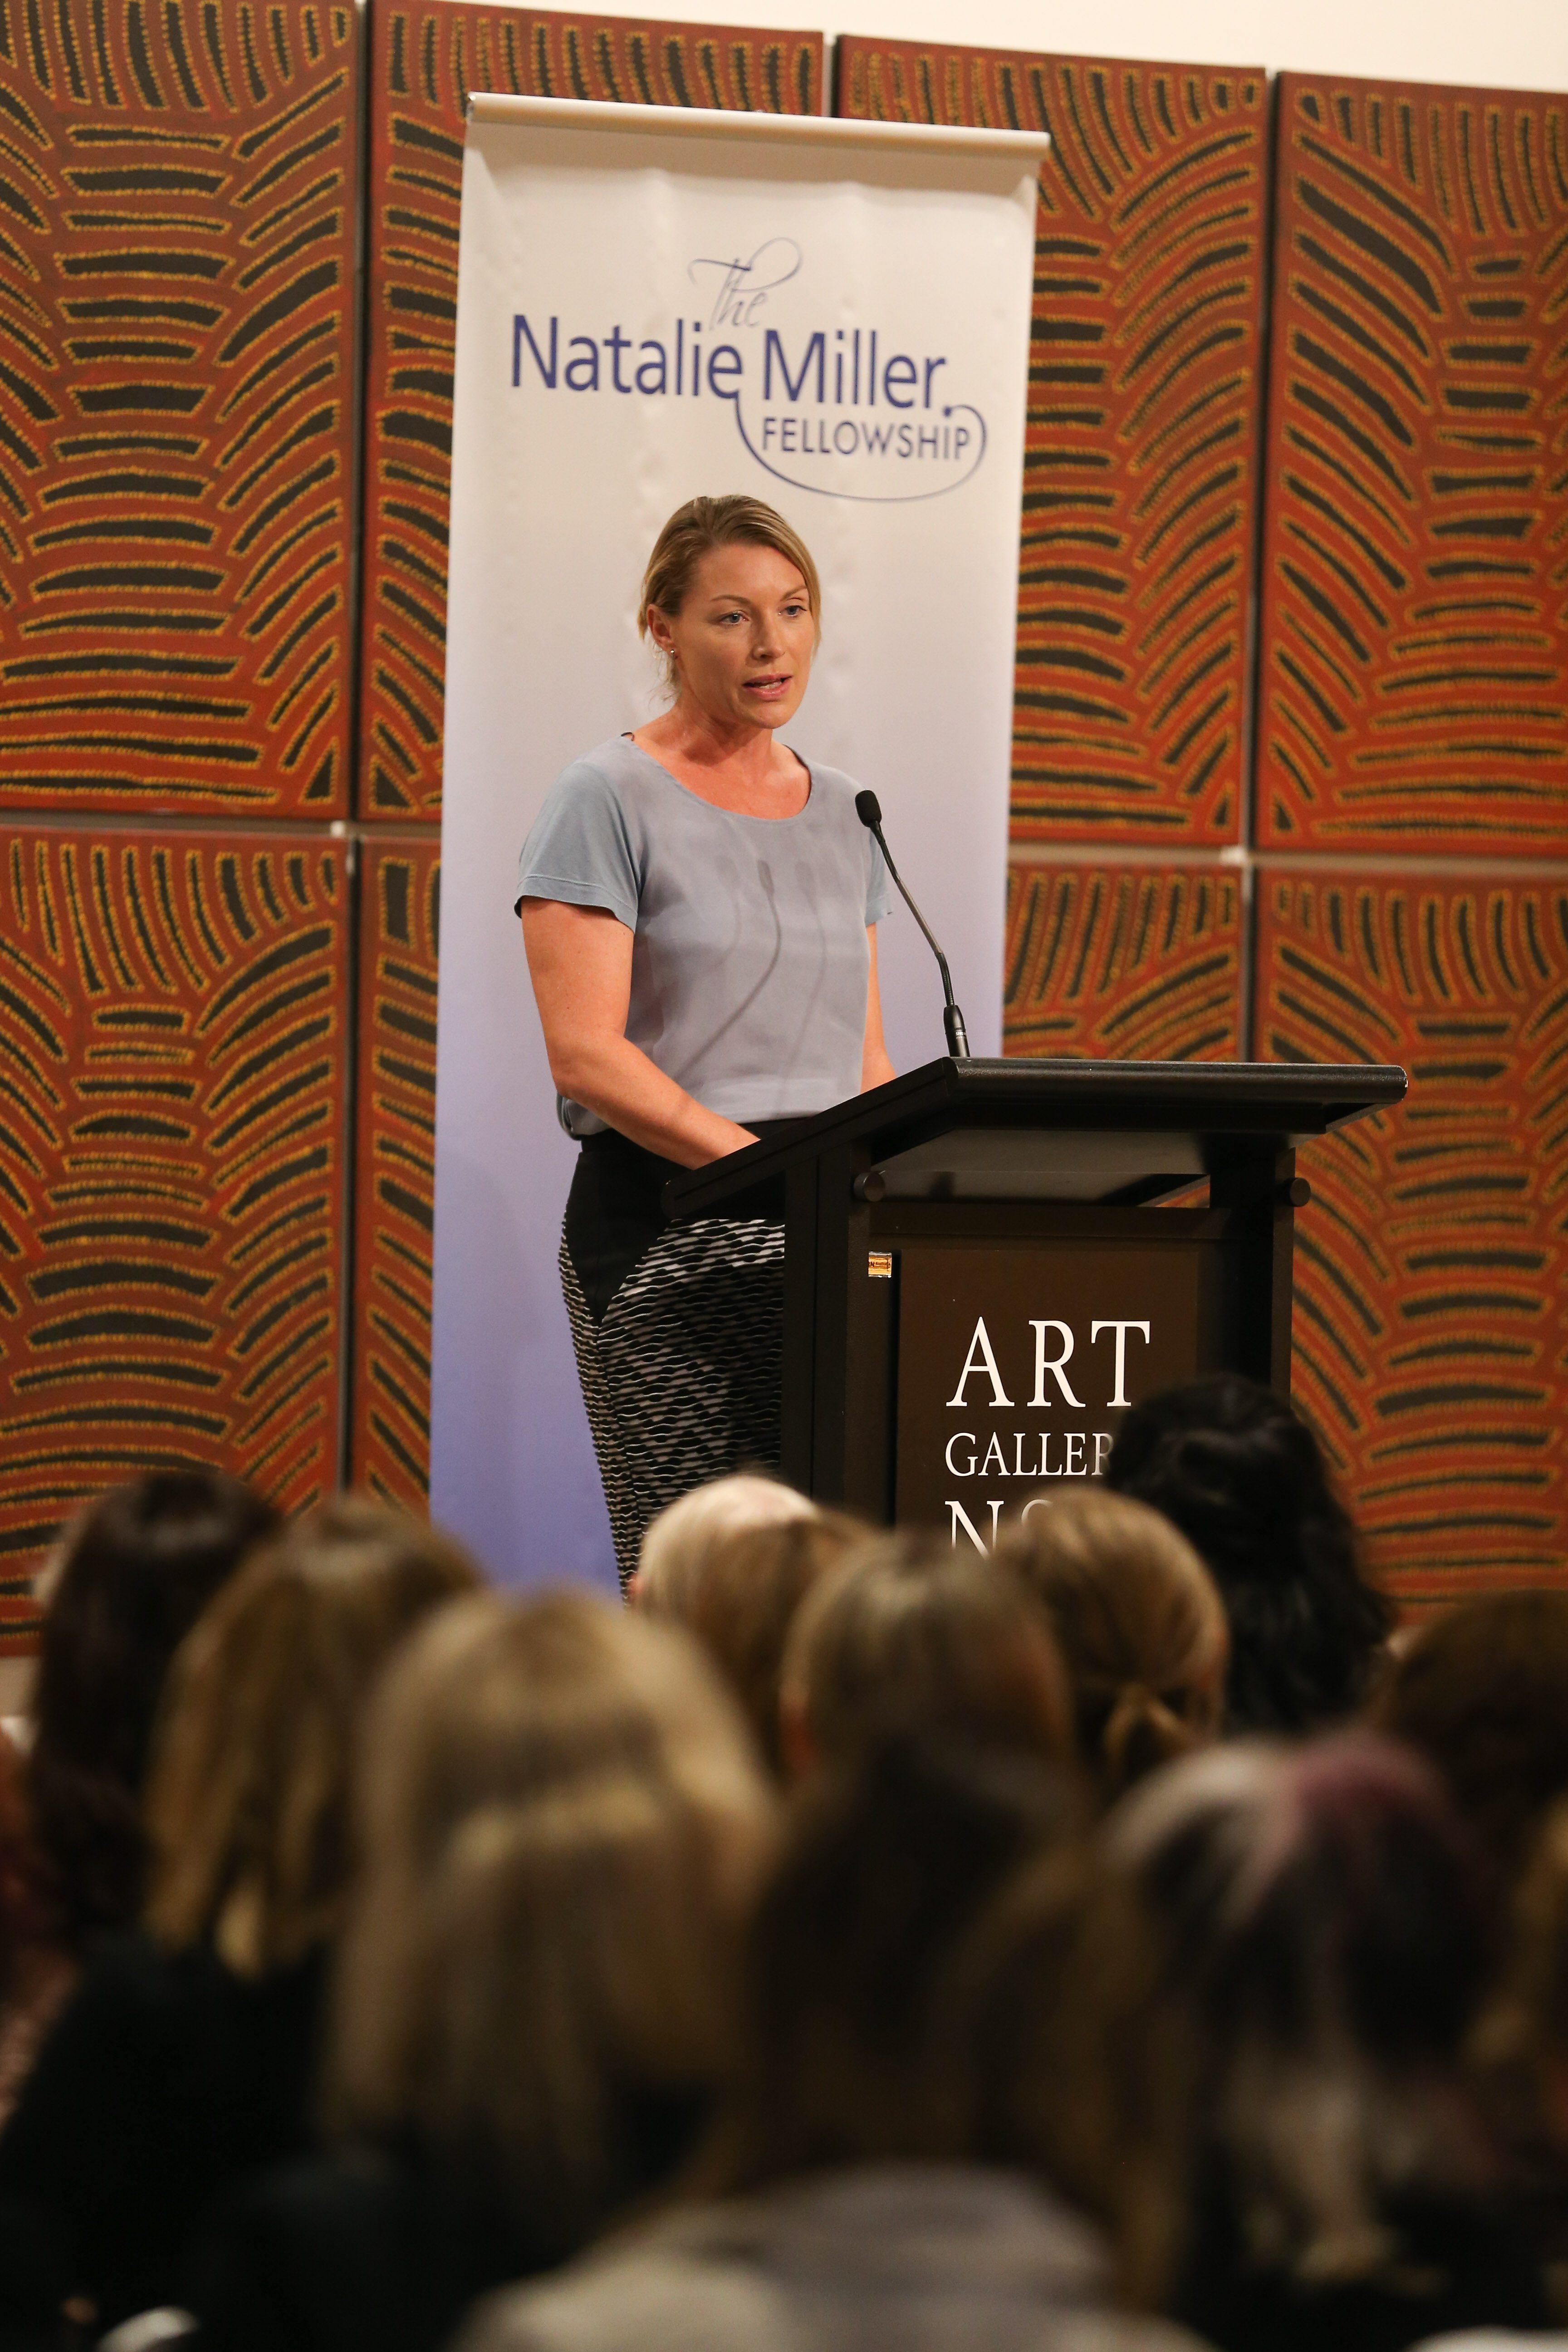 Rebekah Horne, Chief Digital Officer of Channel 10, speaks at Women of Influence and Leadership, Sydney, 2015